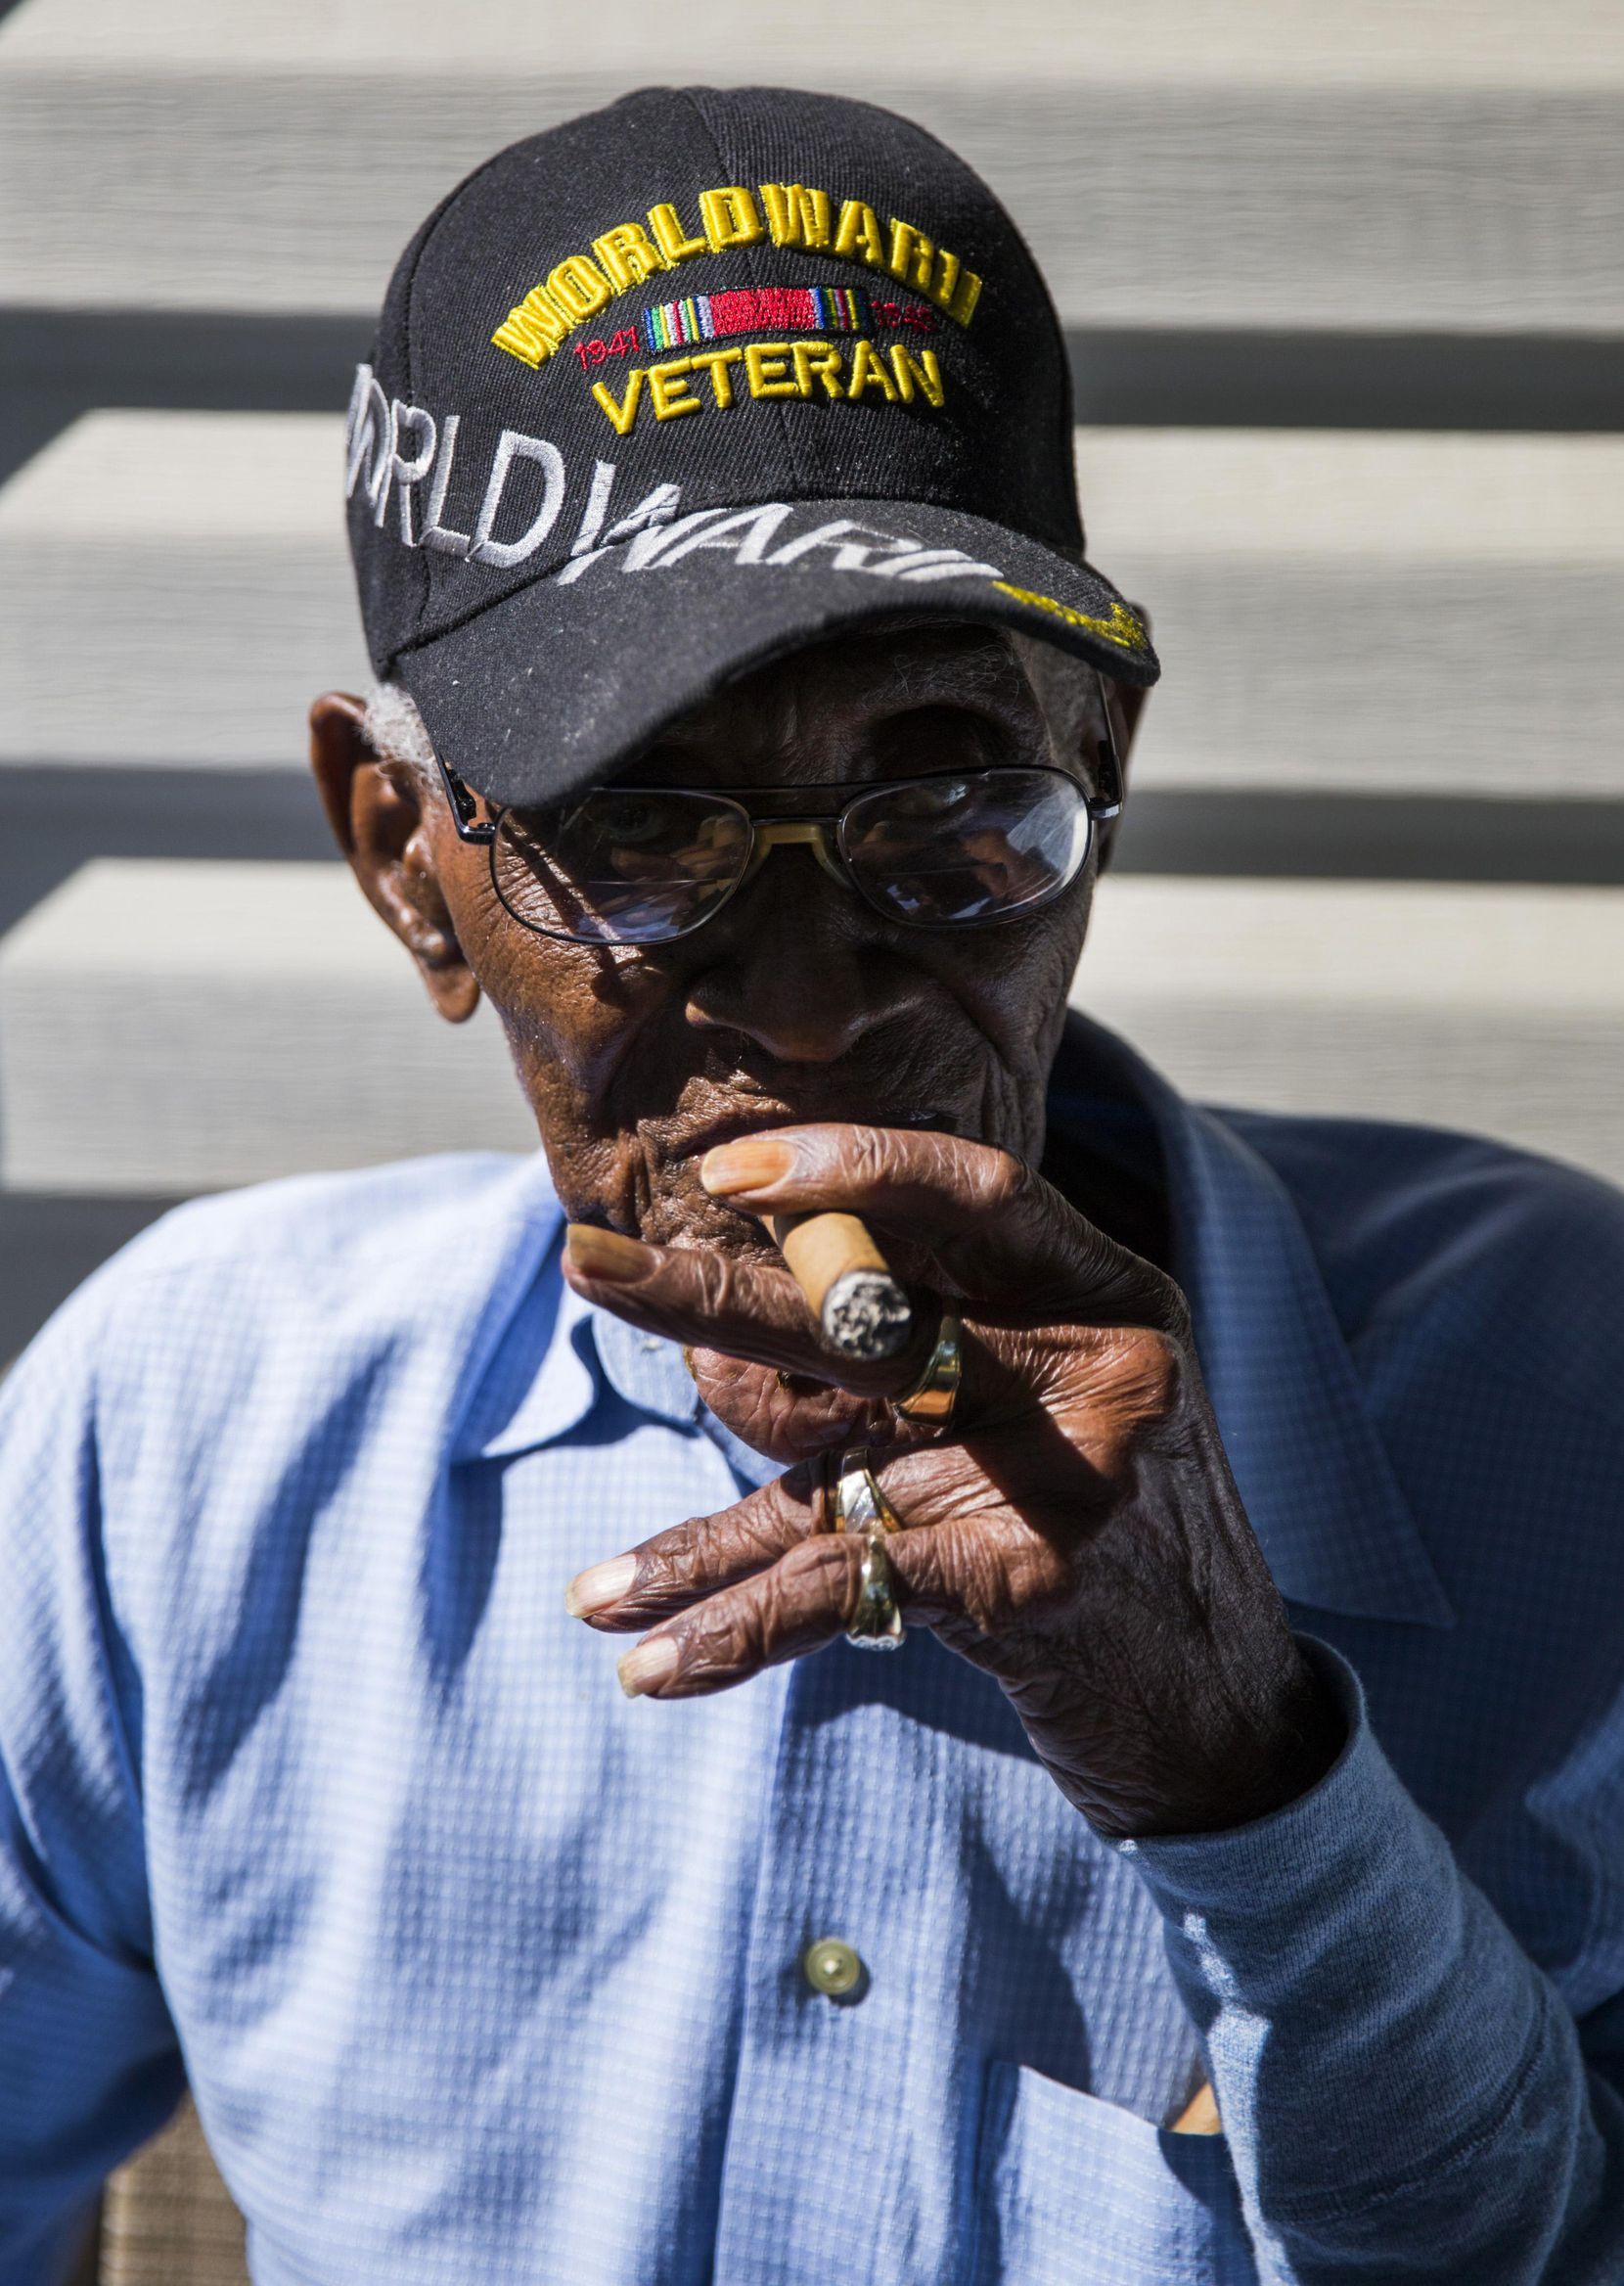 Richard Overton es veterano de la Segunda Guerra Mundial. ASHLEY LANDIS/DMN